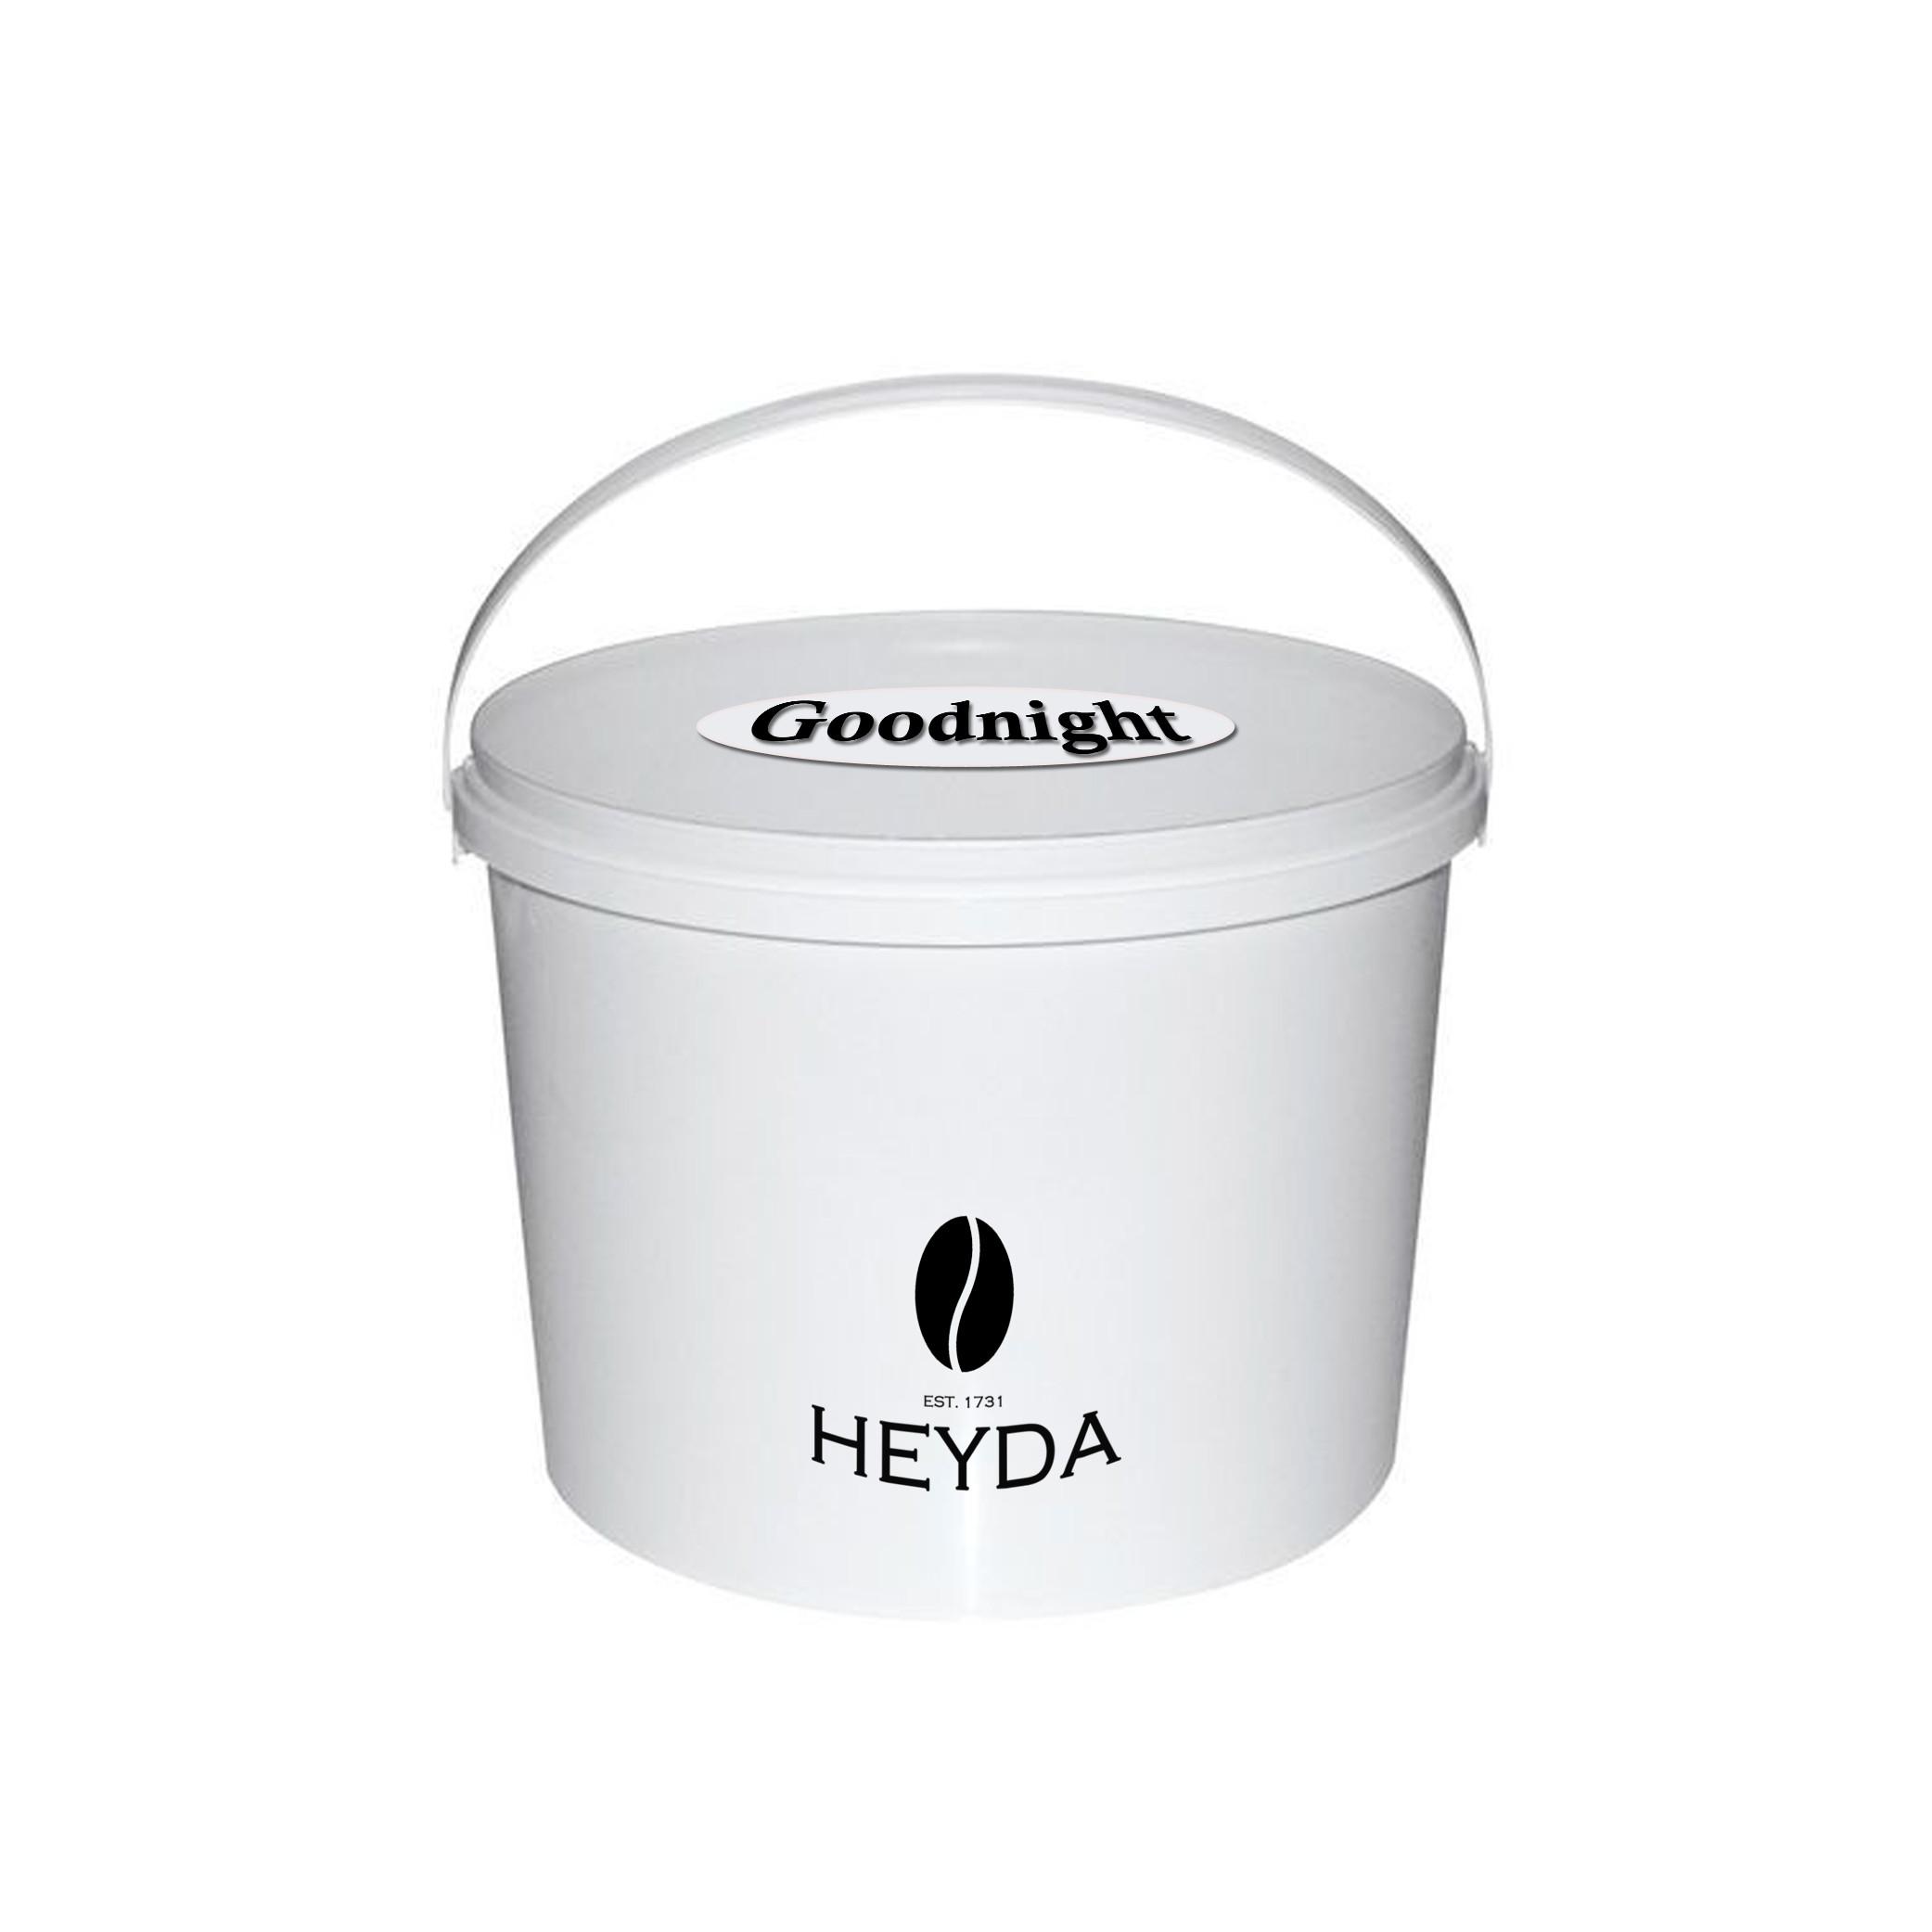 Heyda Goodnight café Decafeiné 4kg Grains (Koffie)